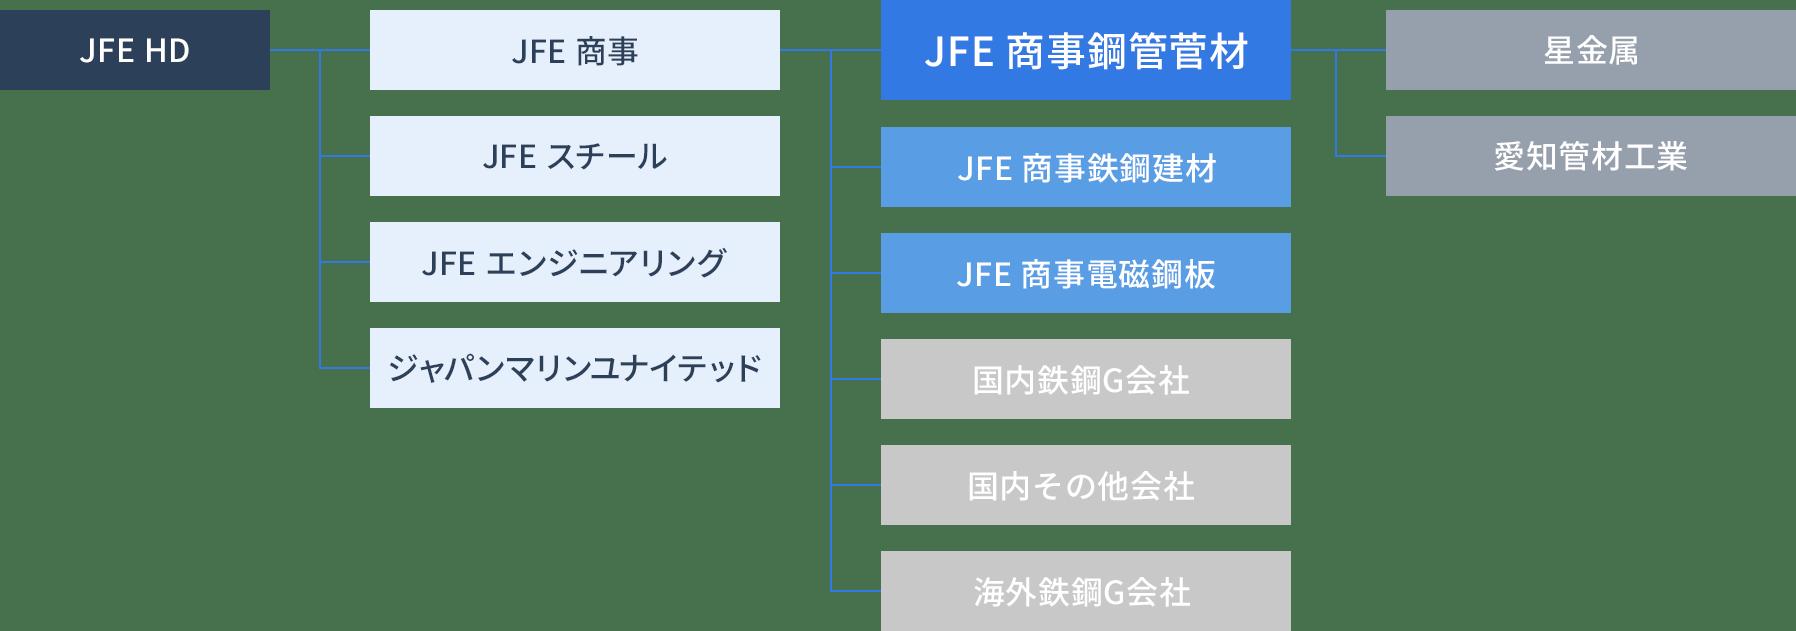 JFEグループの鋼管中核商社として